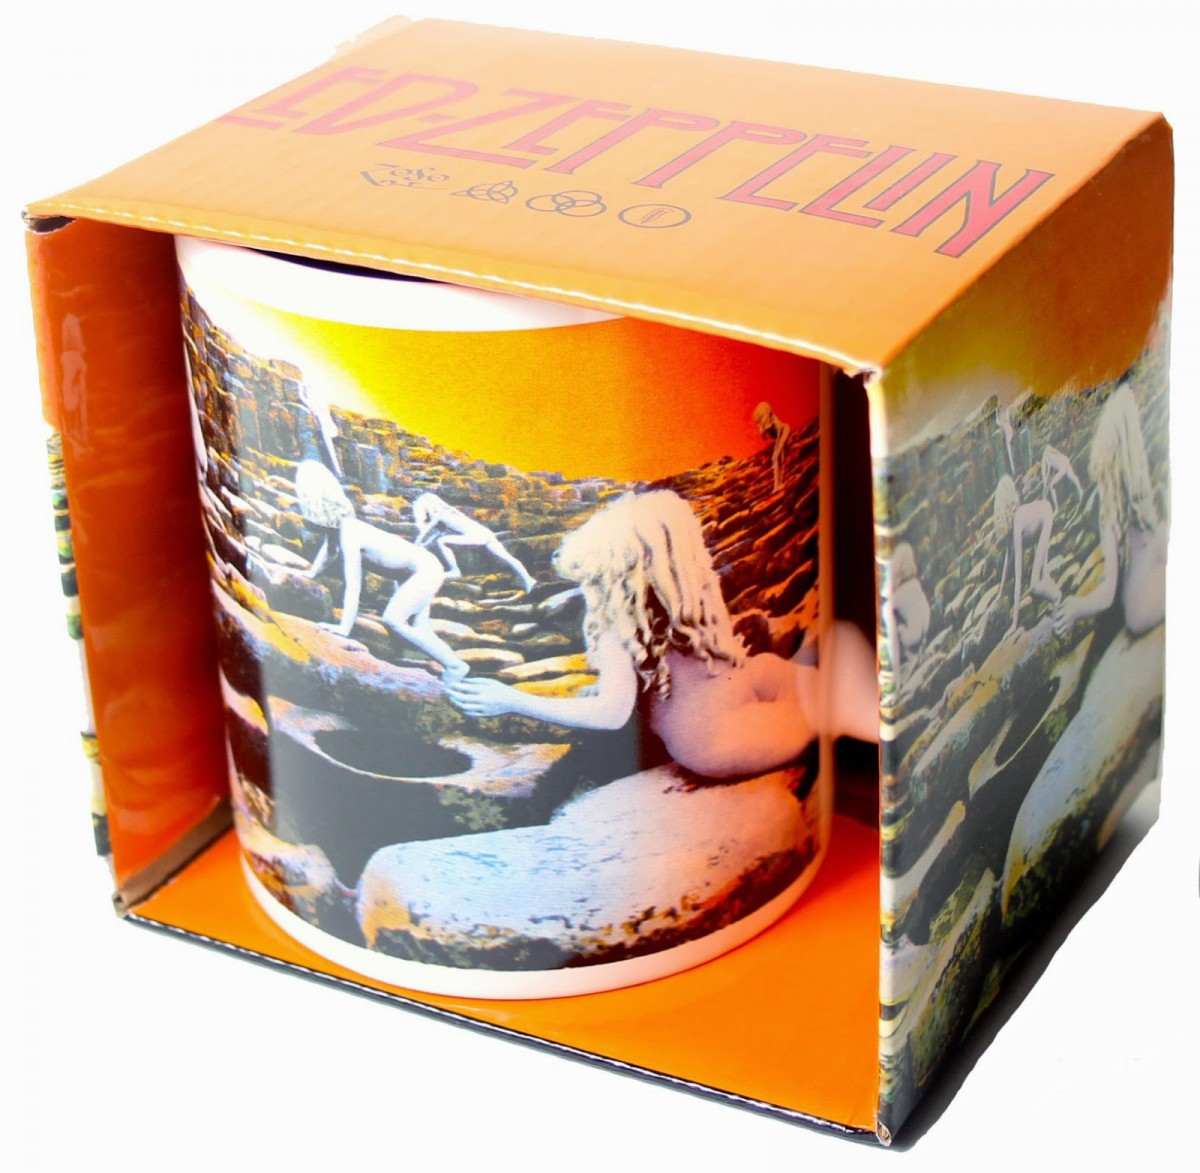 led-zeppelin-houses-of-the-holy-mug-10322-p